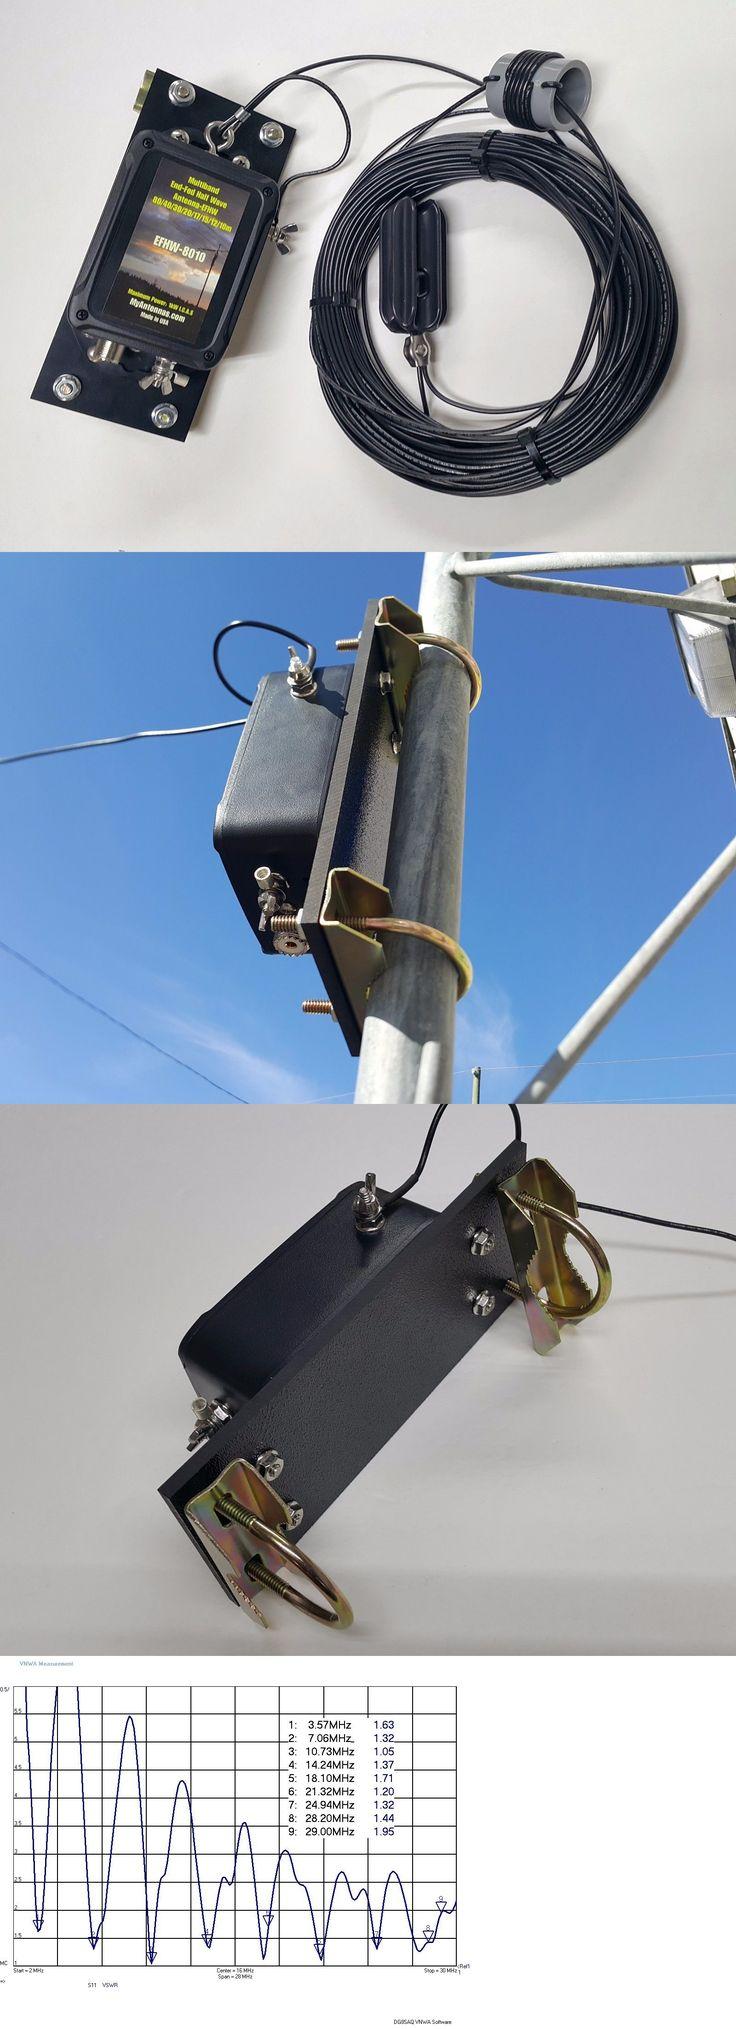 Ham Amateur Radio Antennas: Hf End Fed Antenna Efhw-8010-1K / Installation-Plate / Low Swr/ 130 Feet Long -> BUY IT NOW ONLY: $154.99 on eBay!